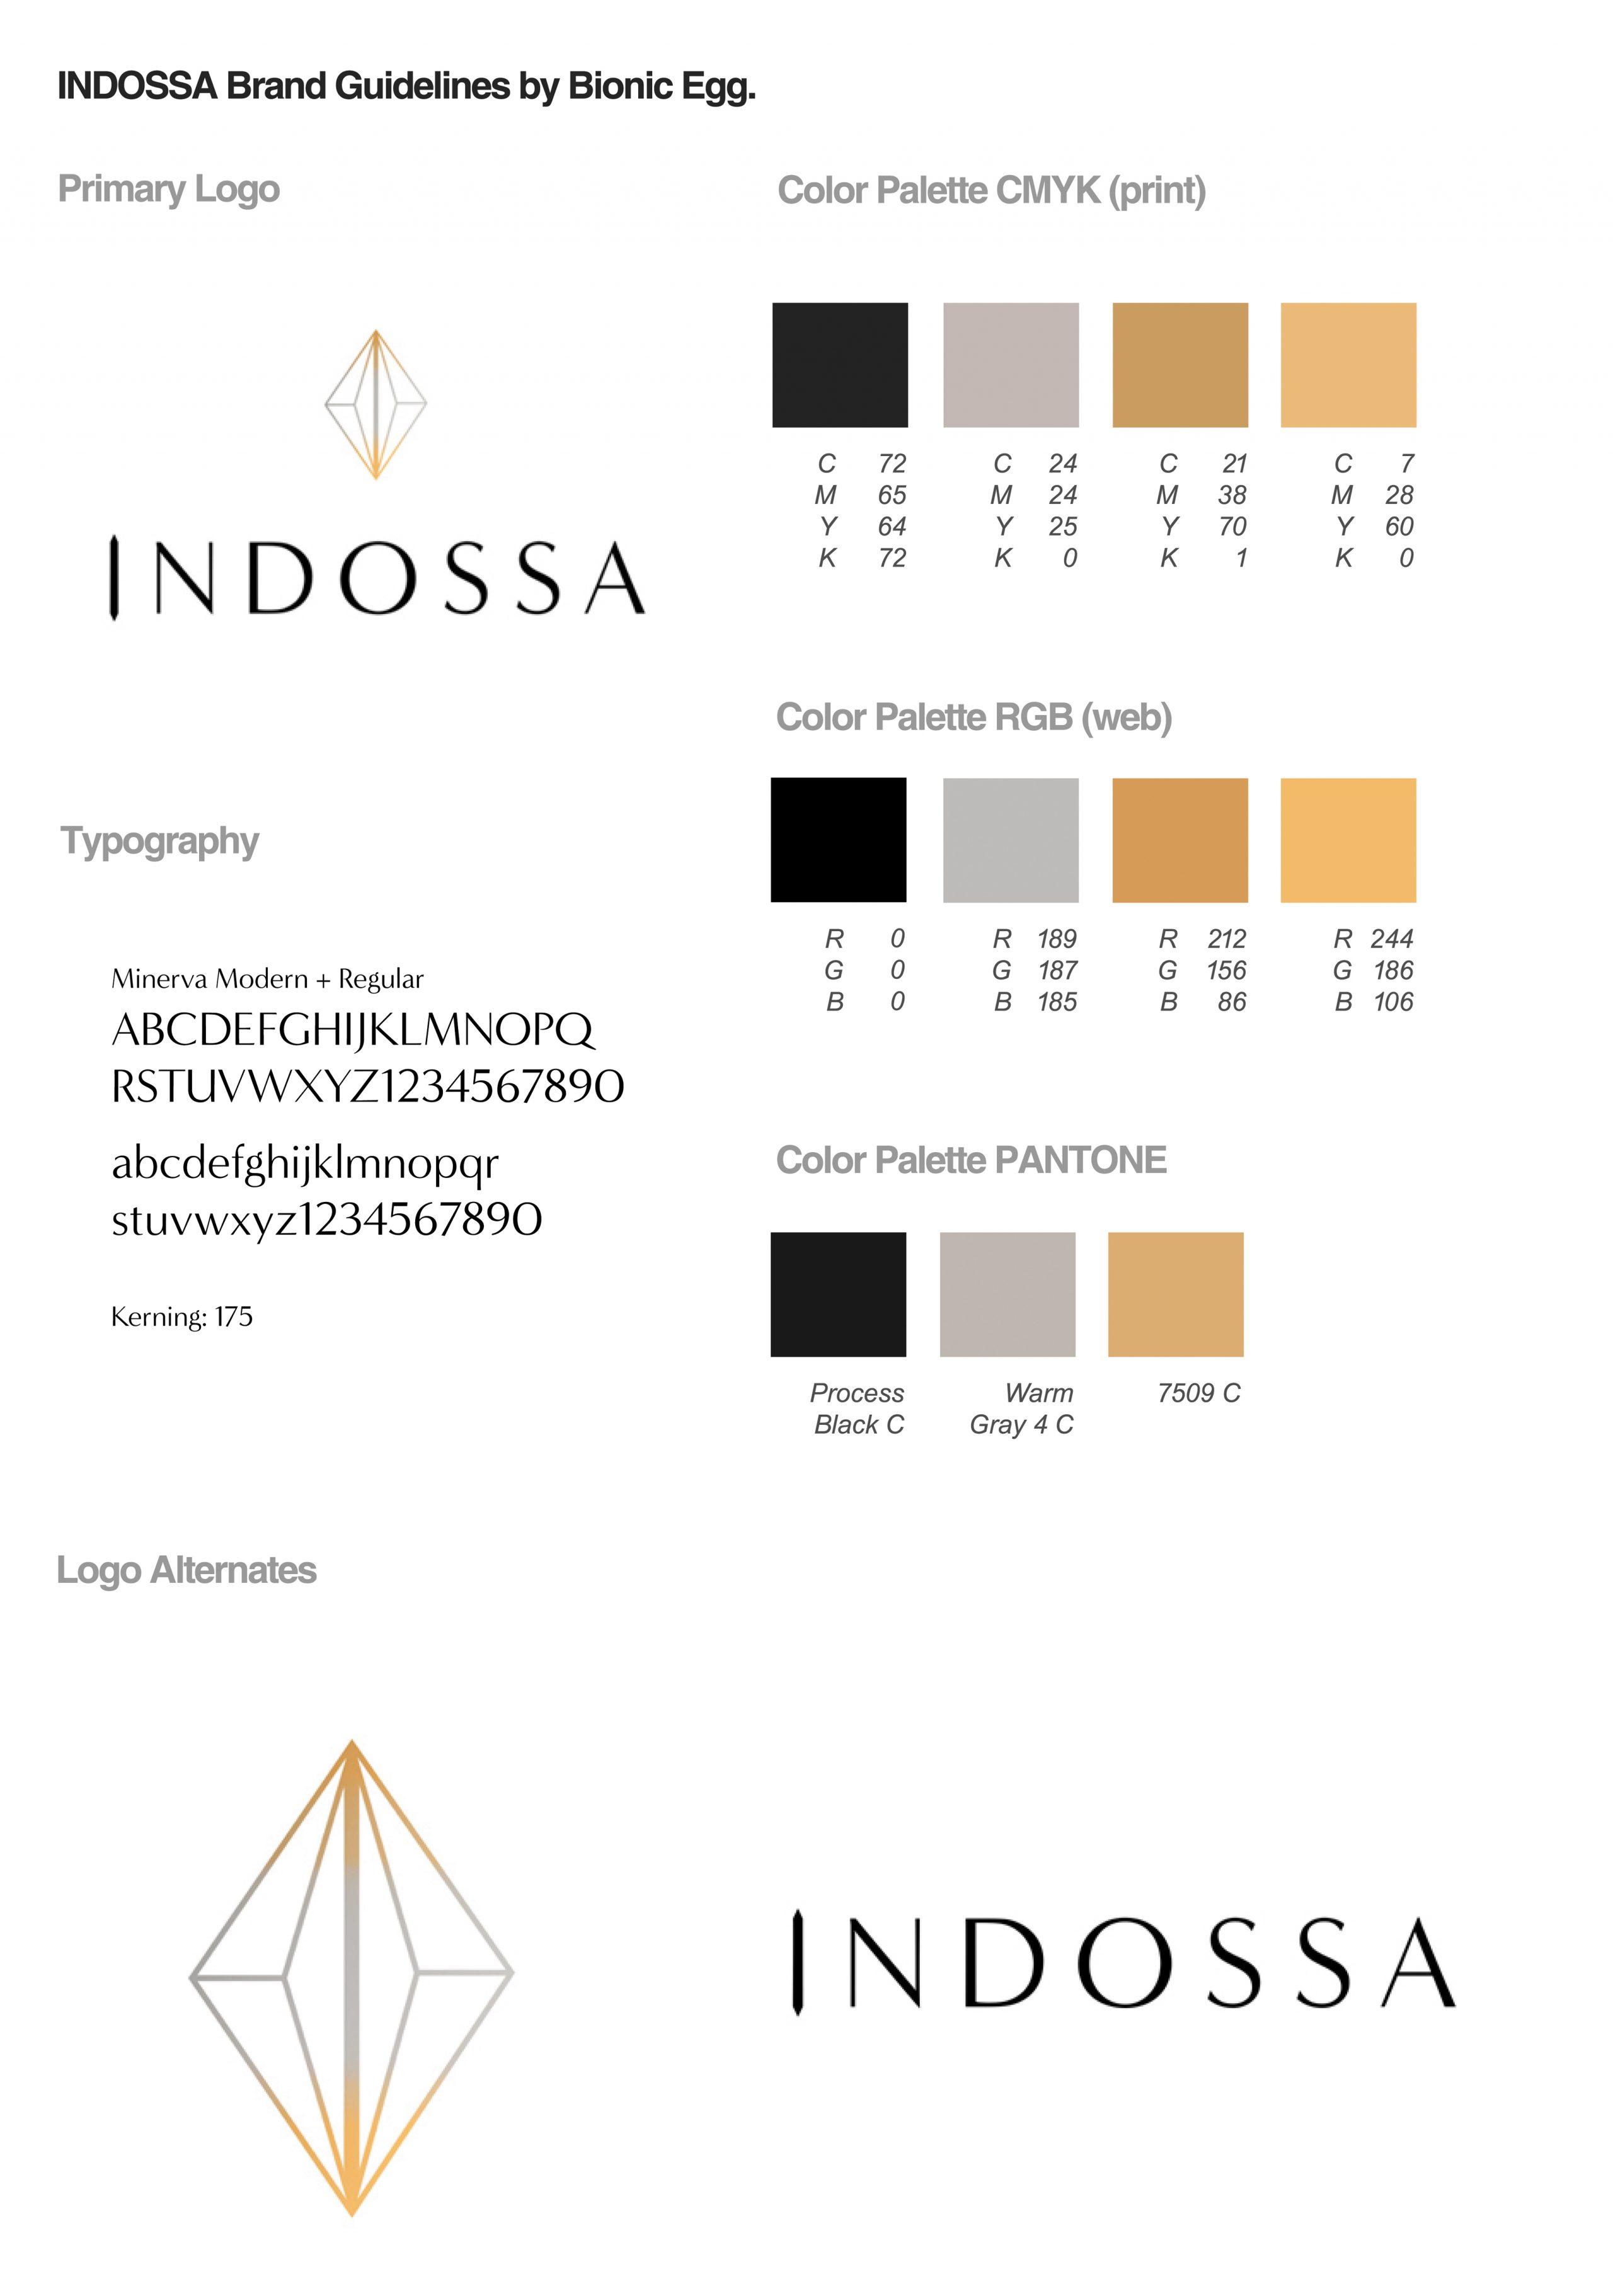 INDOSSA Brand Guidelines